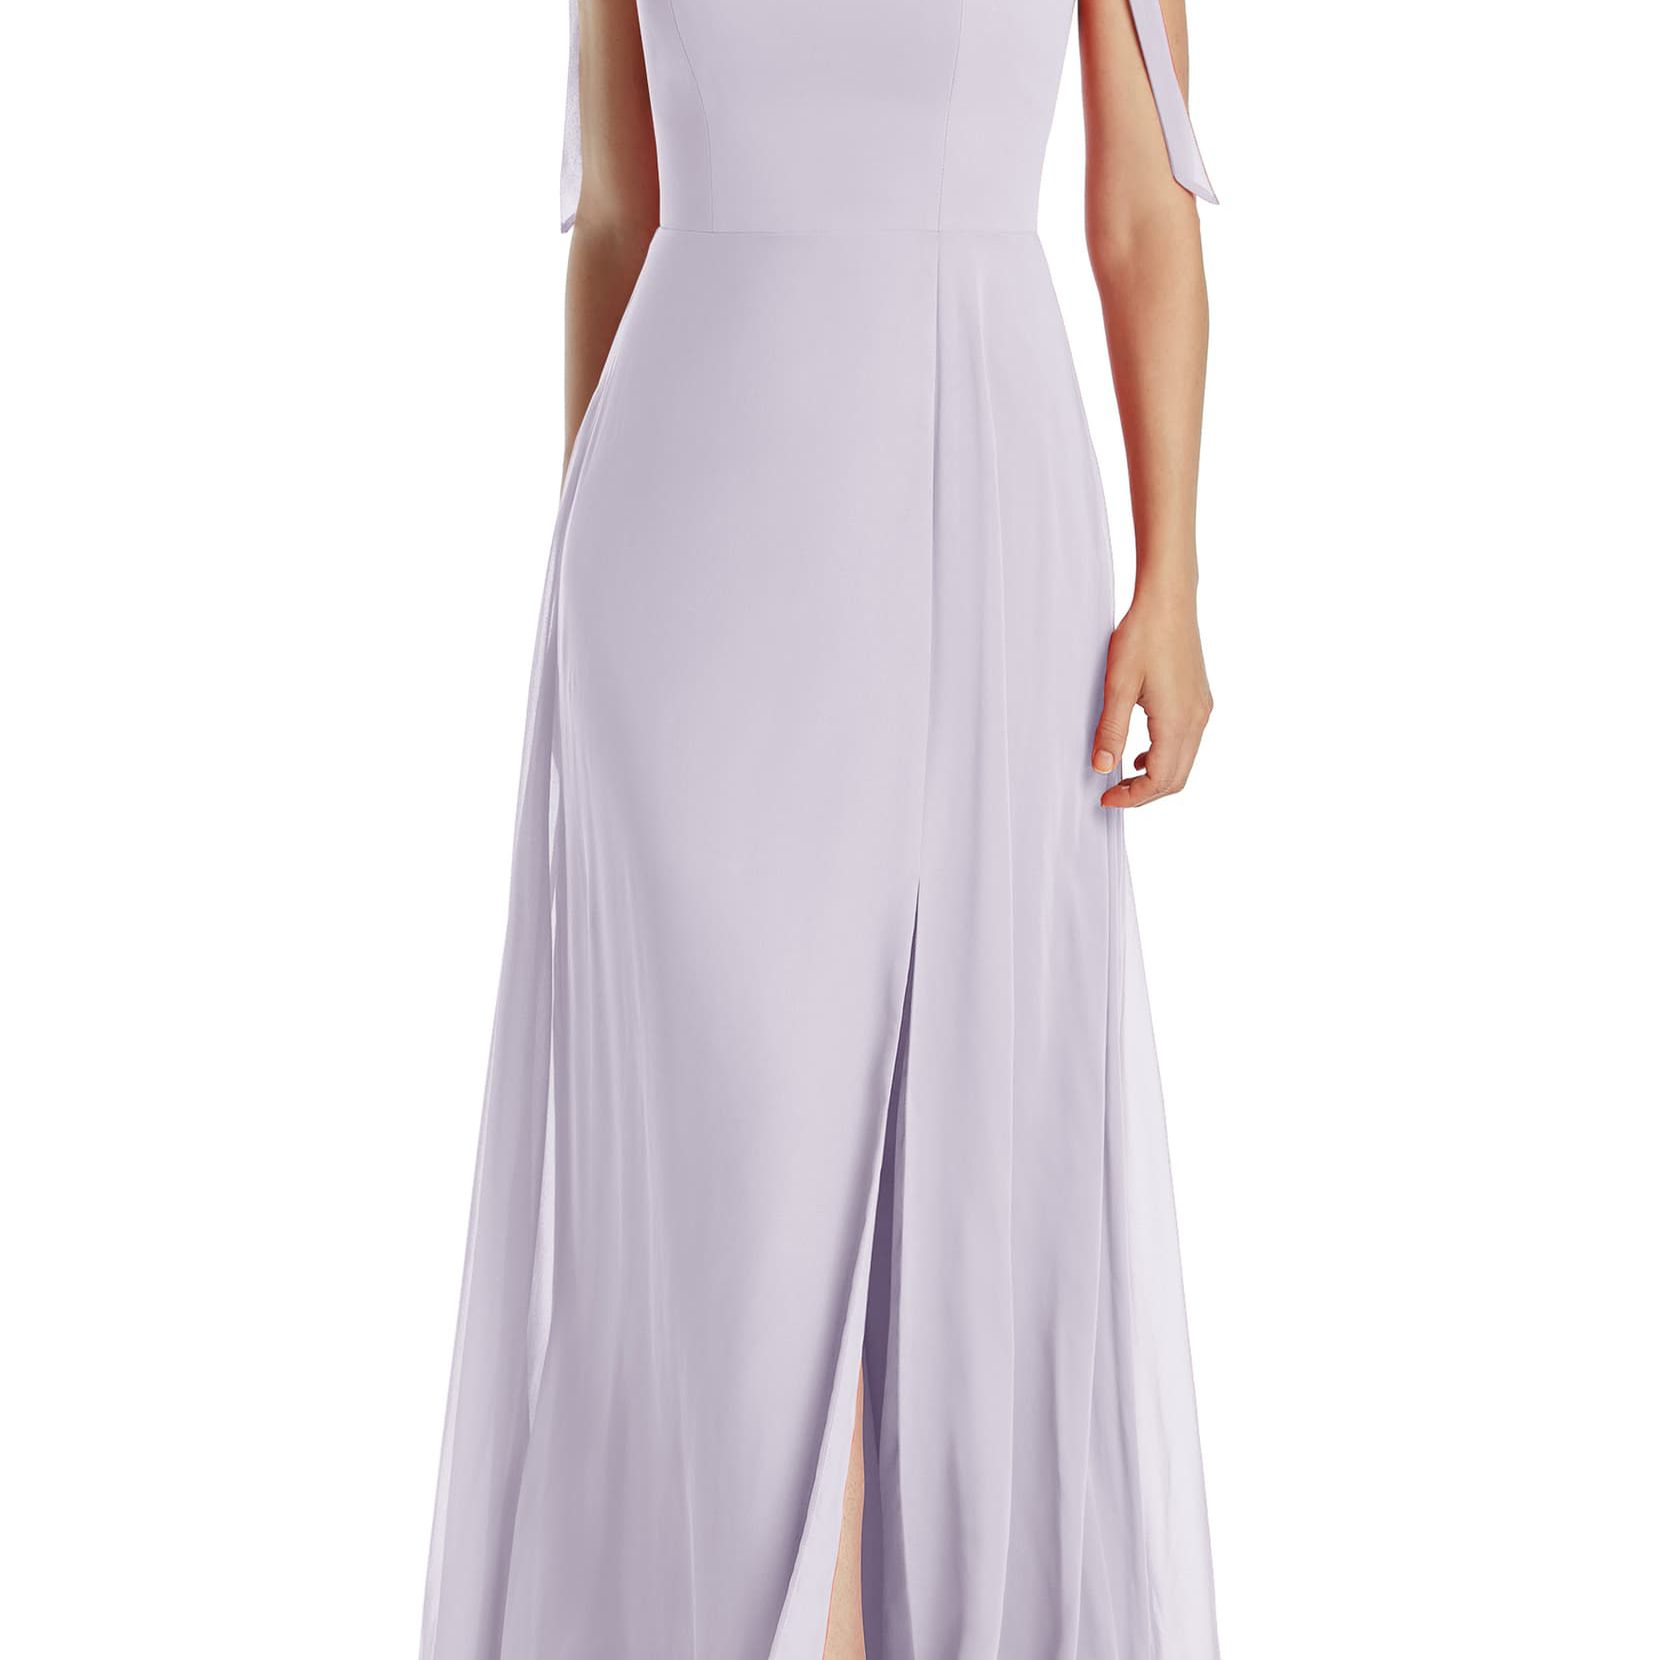 Dessy Collection Shoulder Tie Chiffon Evening Dress $239